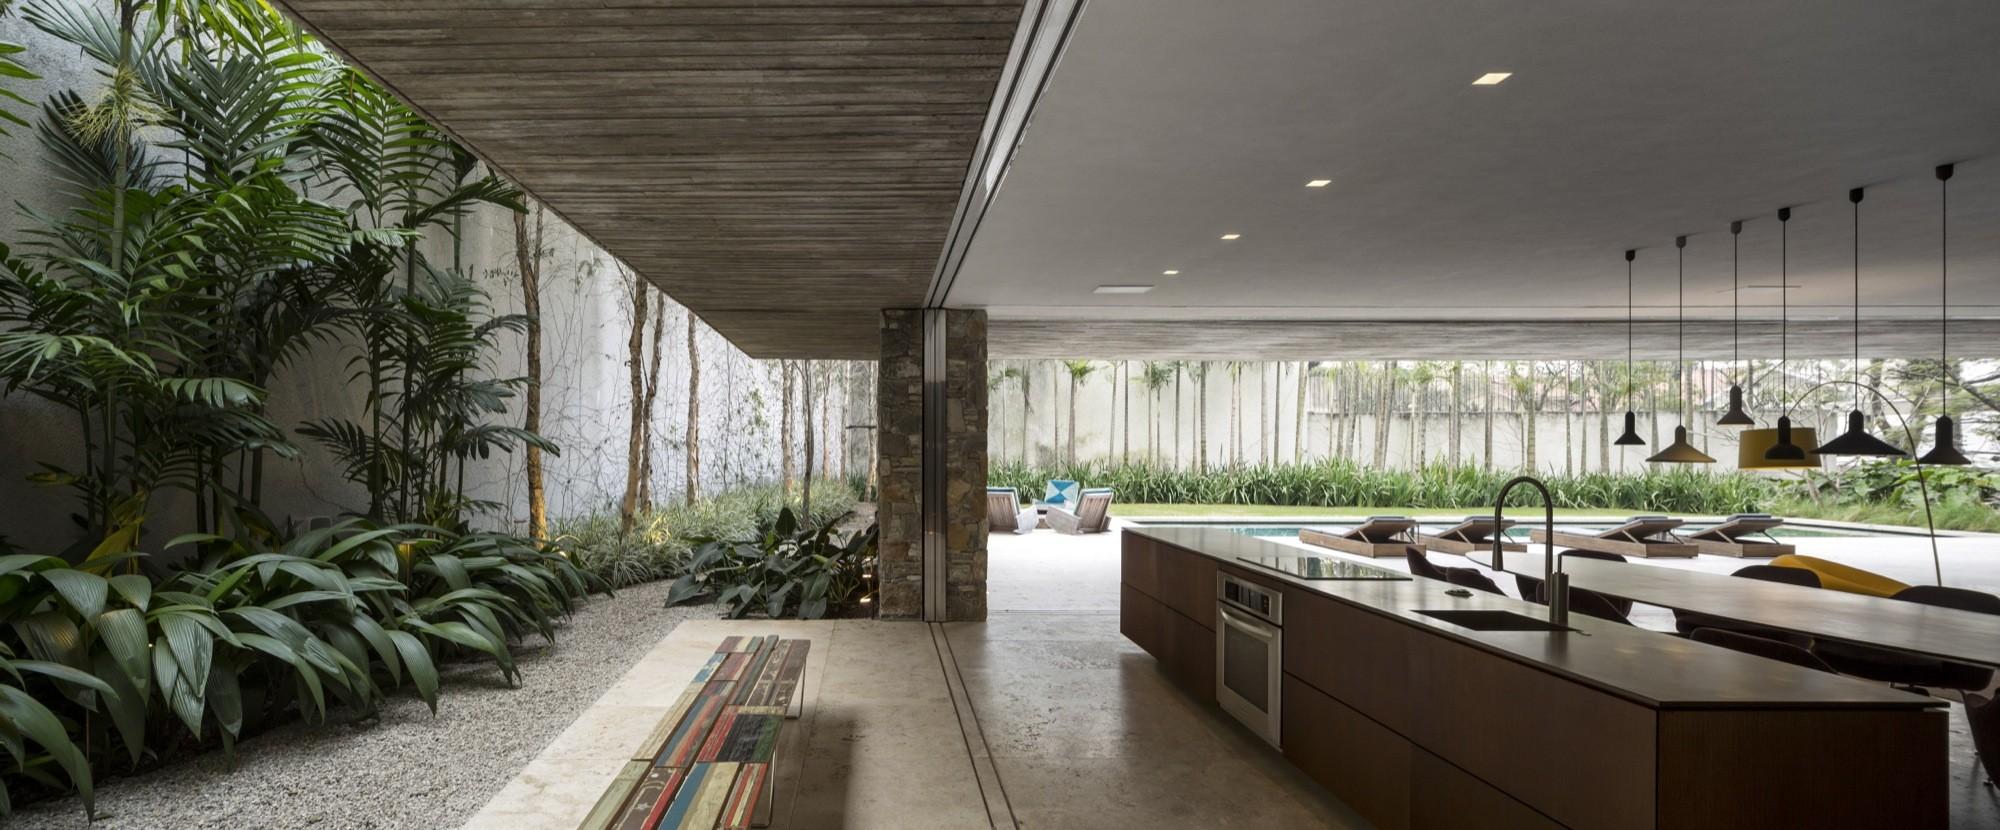 Open layout house concept by studio mk27 - Fernando Guerra Fg Sg